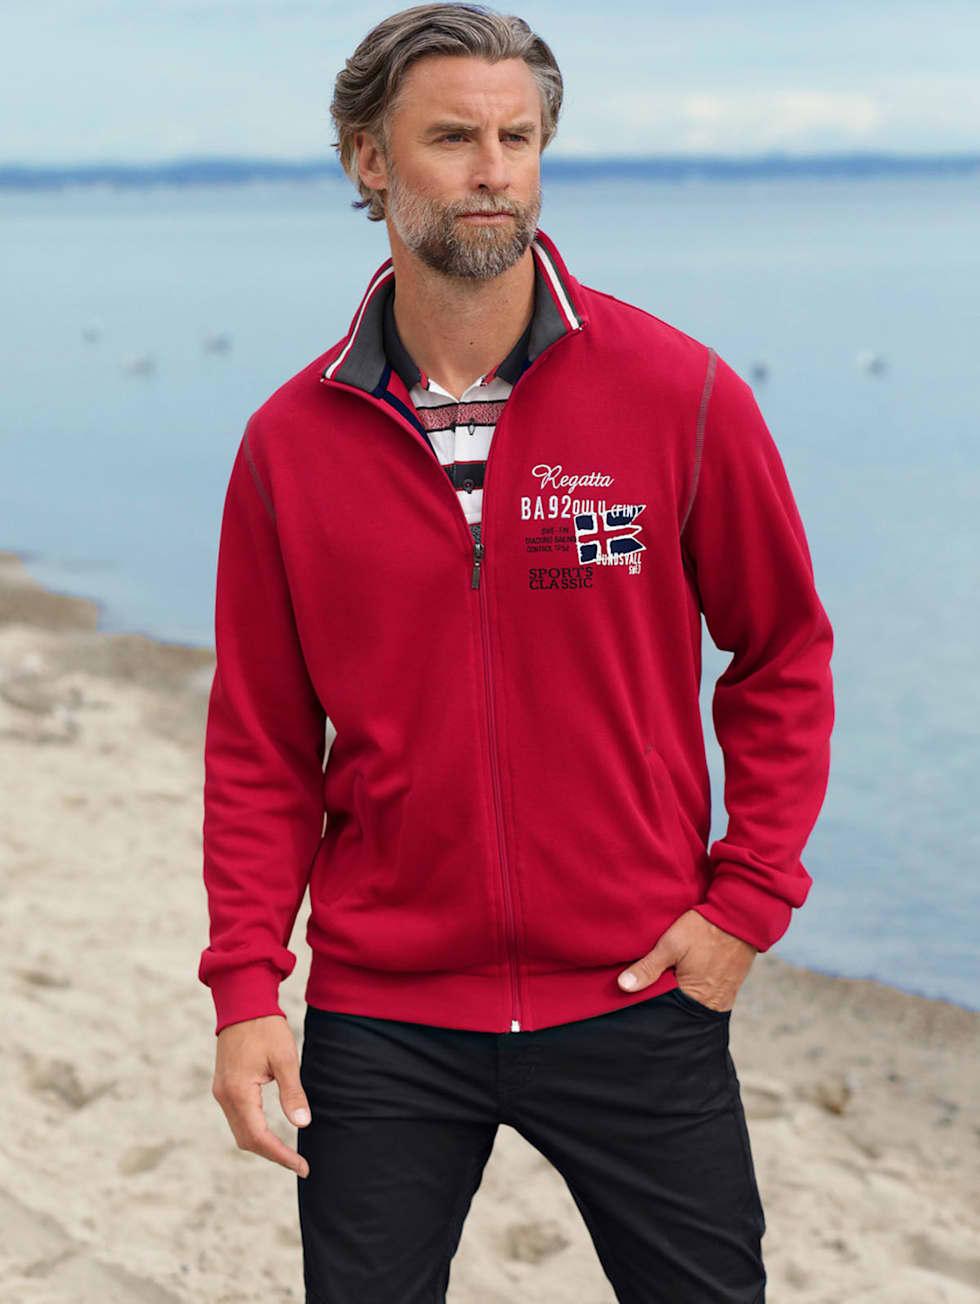 Marittimo-Outfit: Rote Sweatjacke, rotes Poloshirt und eine marinefarbene Hose